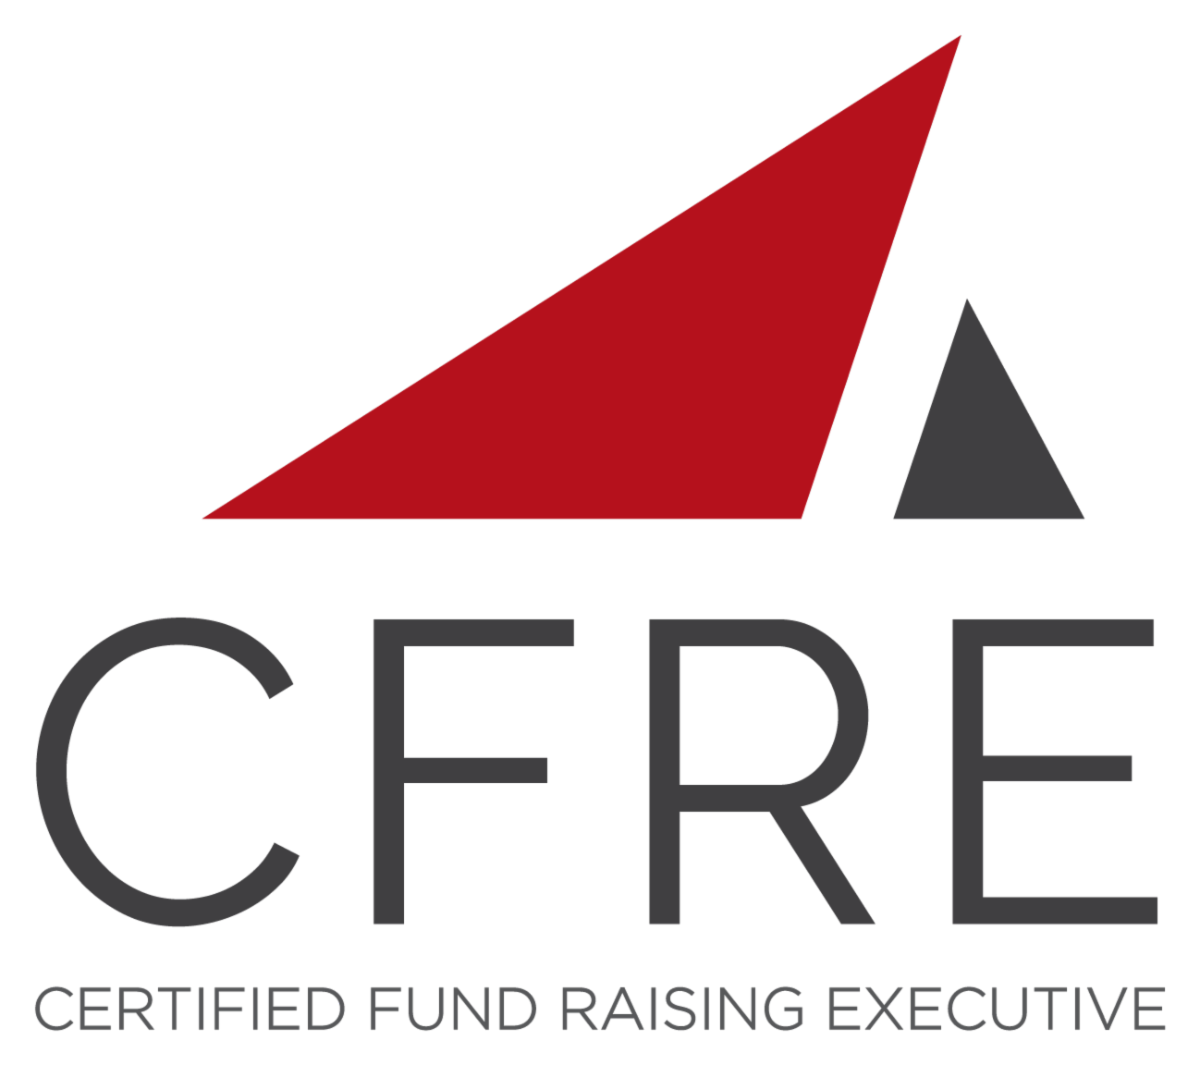 CFRE logo